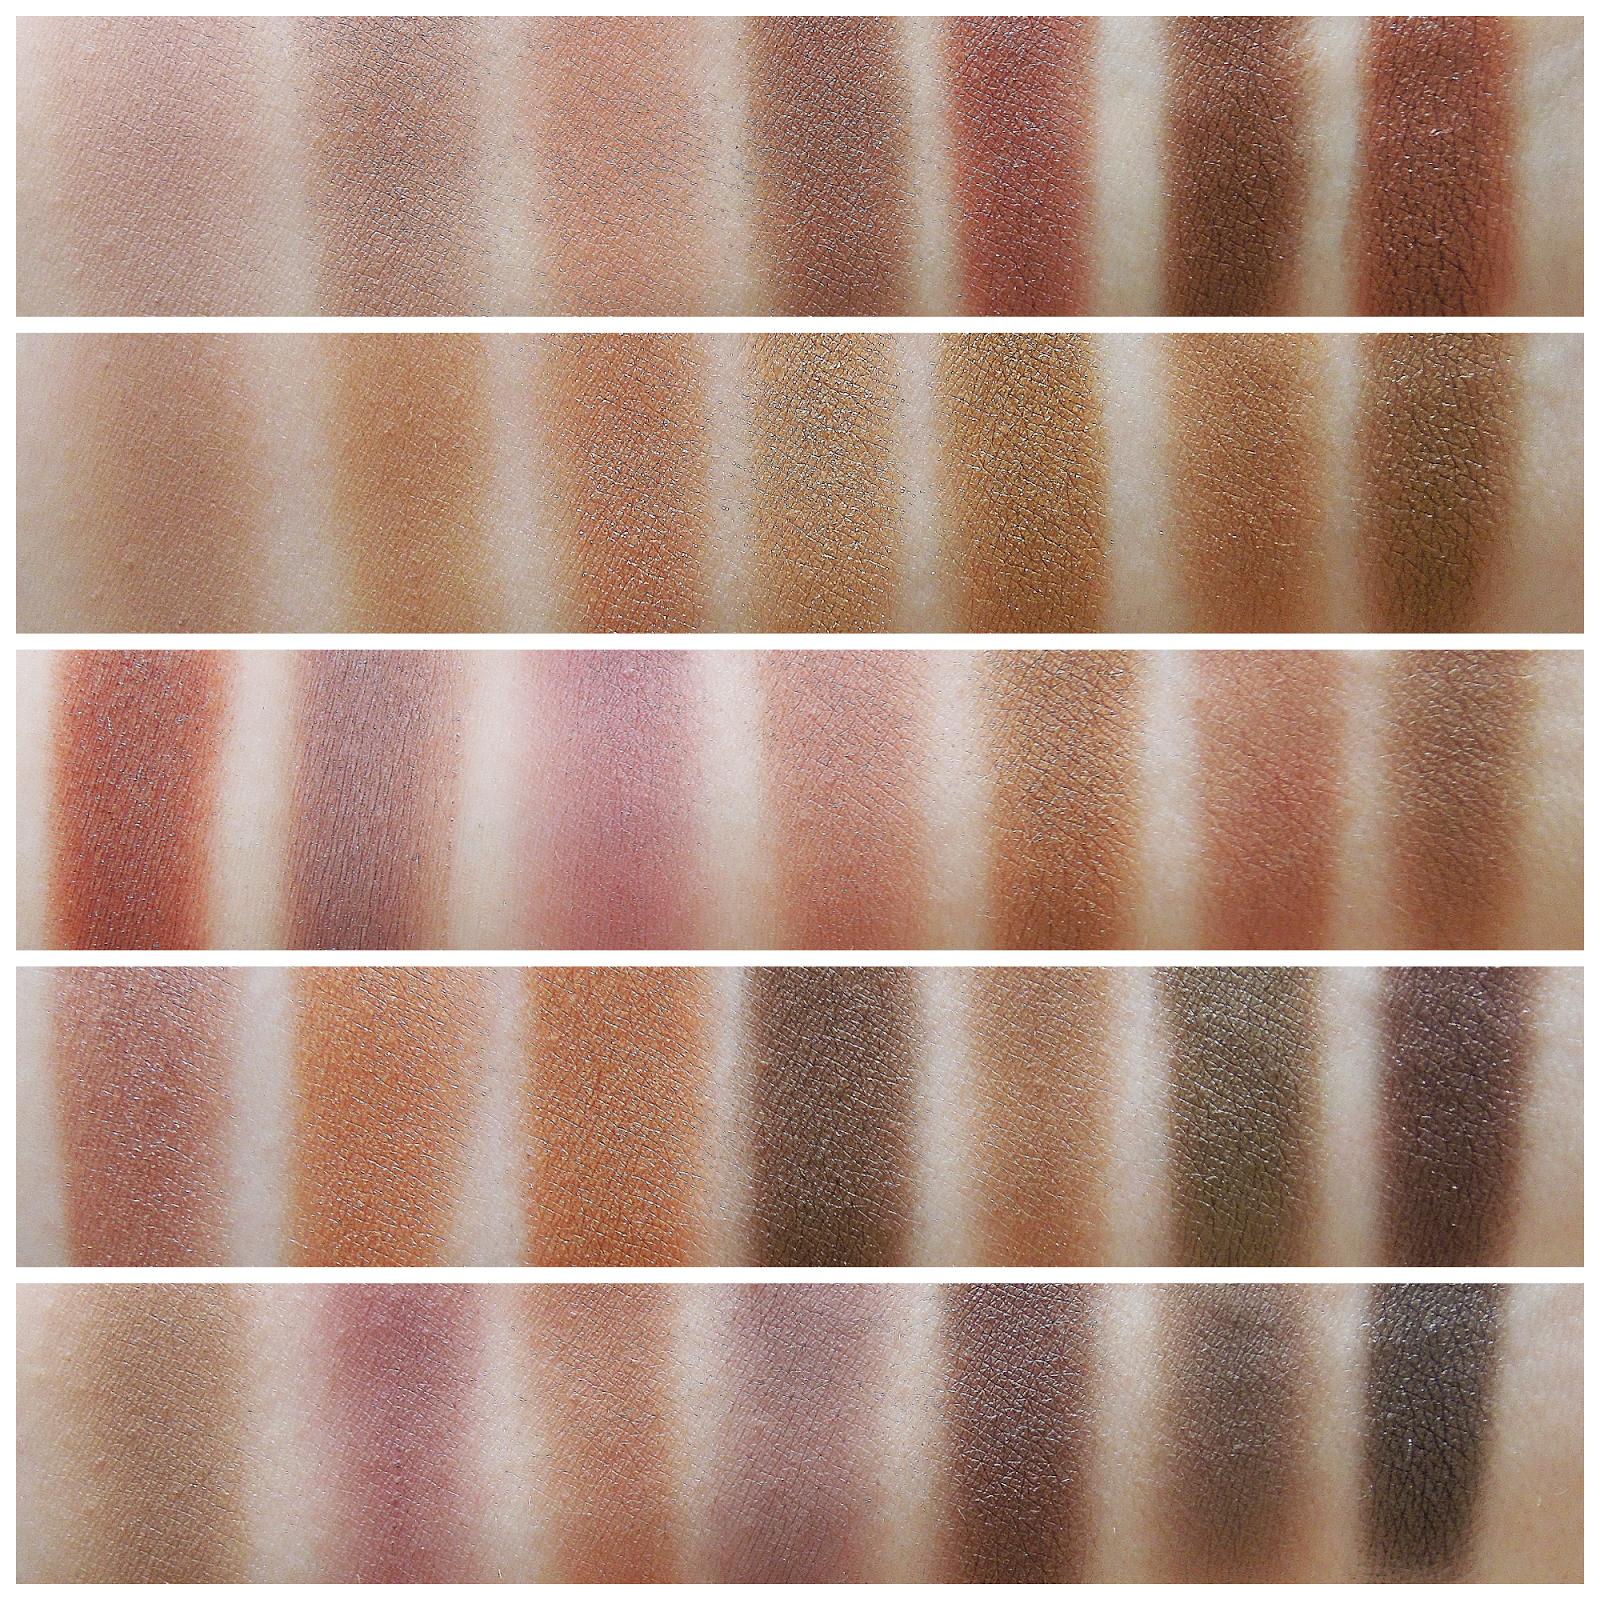 Morphe 35k eyeshadow palette review beauty in bold - Morphe 35t Palette Review